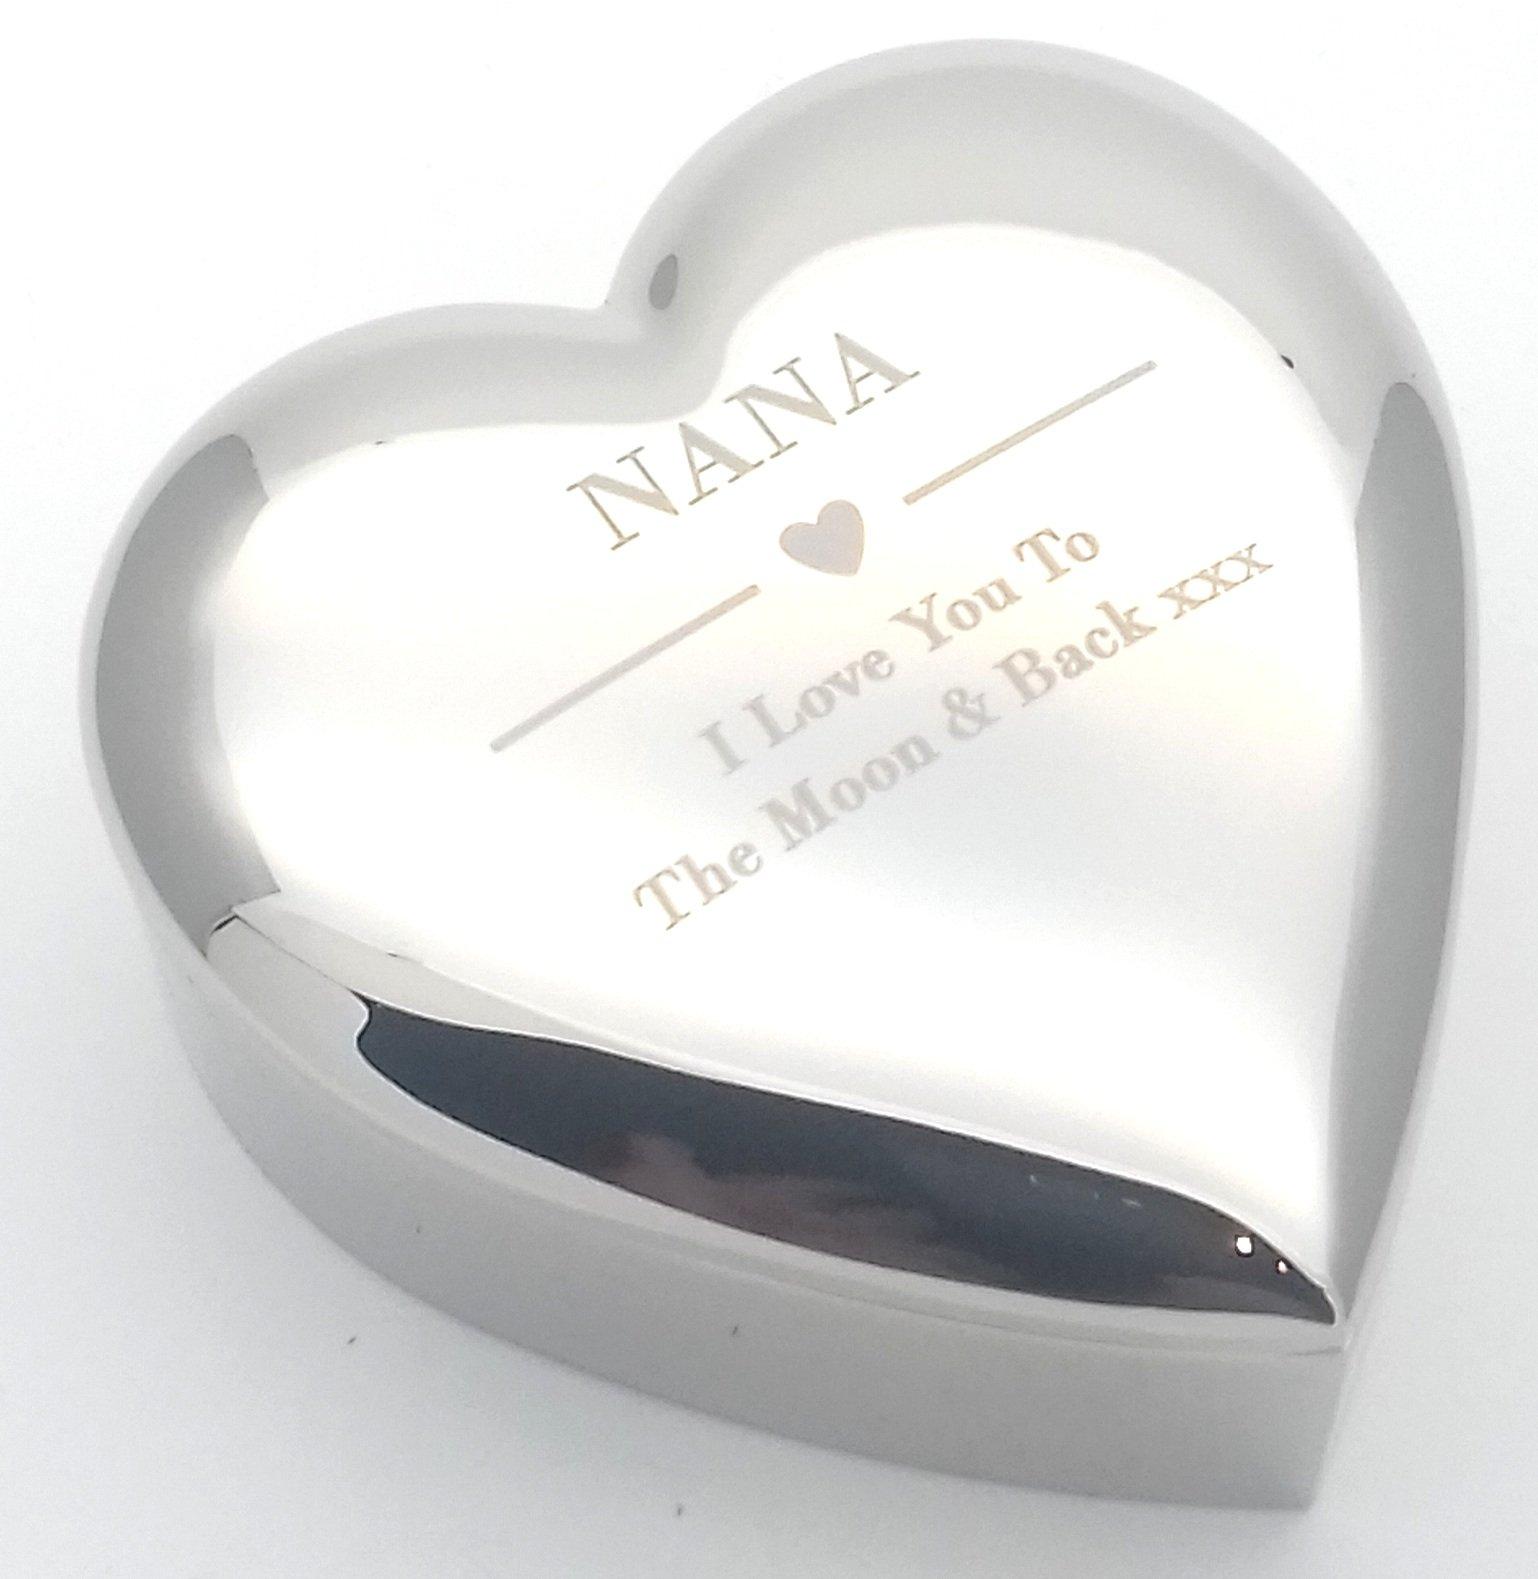 NANA I LOVE YOU TO THE MOON u0026 BACK Silver finish TRINKET BOX Gift Presents Ideas  sc 1 st  Amazon UK & Gifts for Nana: Amazon.co.uk